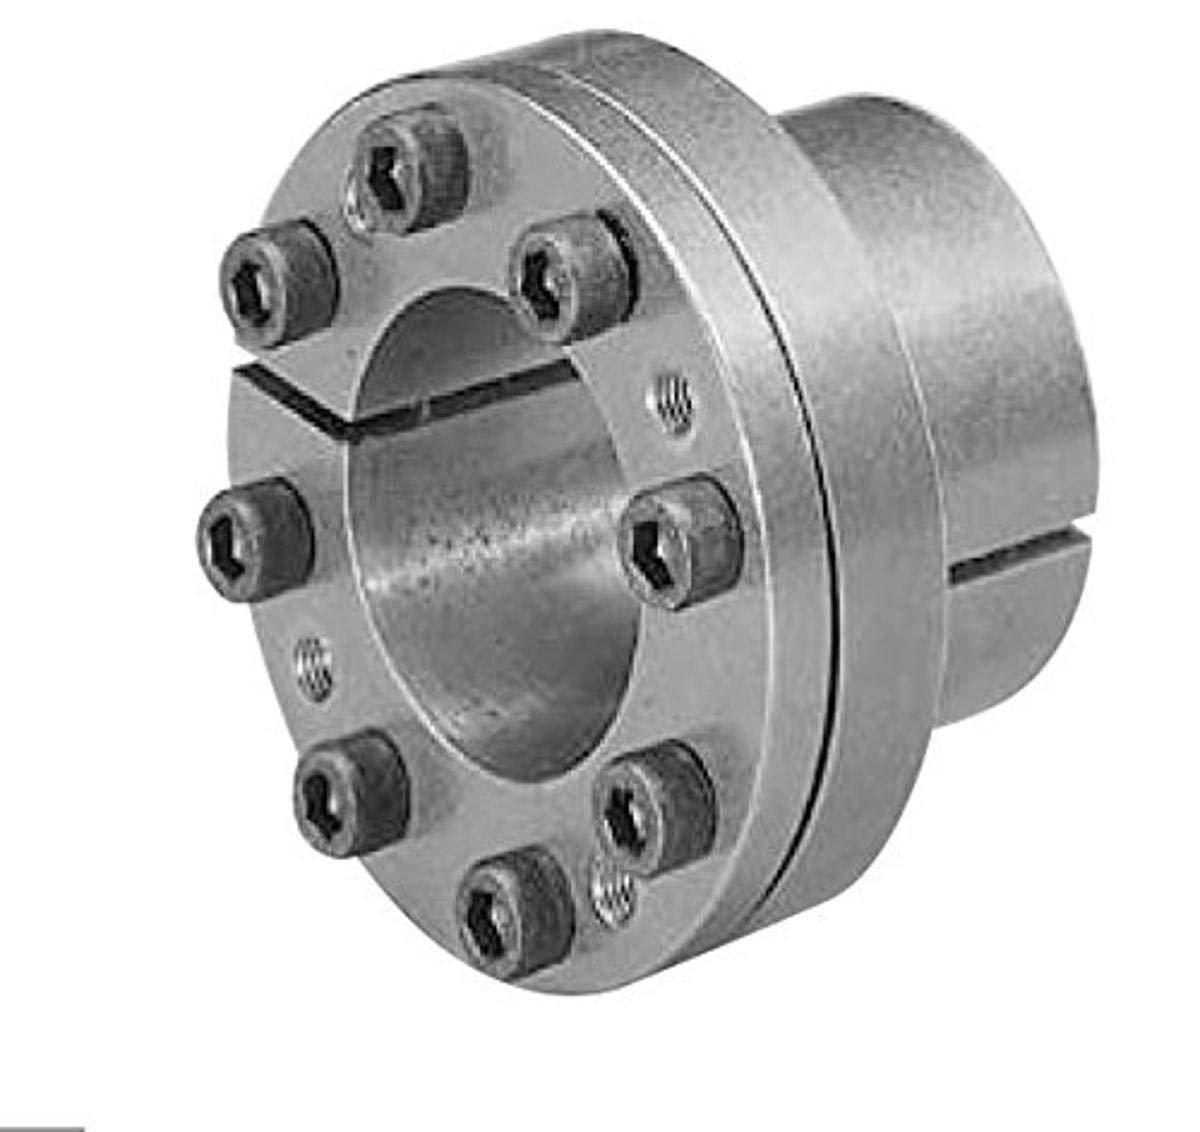 4538 ft-lb Maximum Transmissible Torque 3-1//2 shaft diameter Lovejoy 1500 Series Shaft Locking Device 5.305 Outer Diameter of Shaft Locking Device Inch